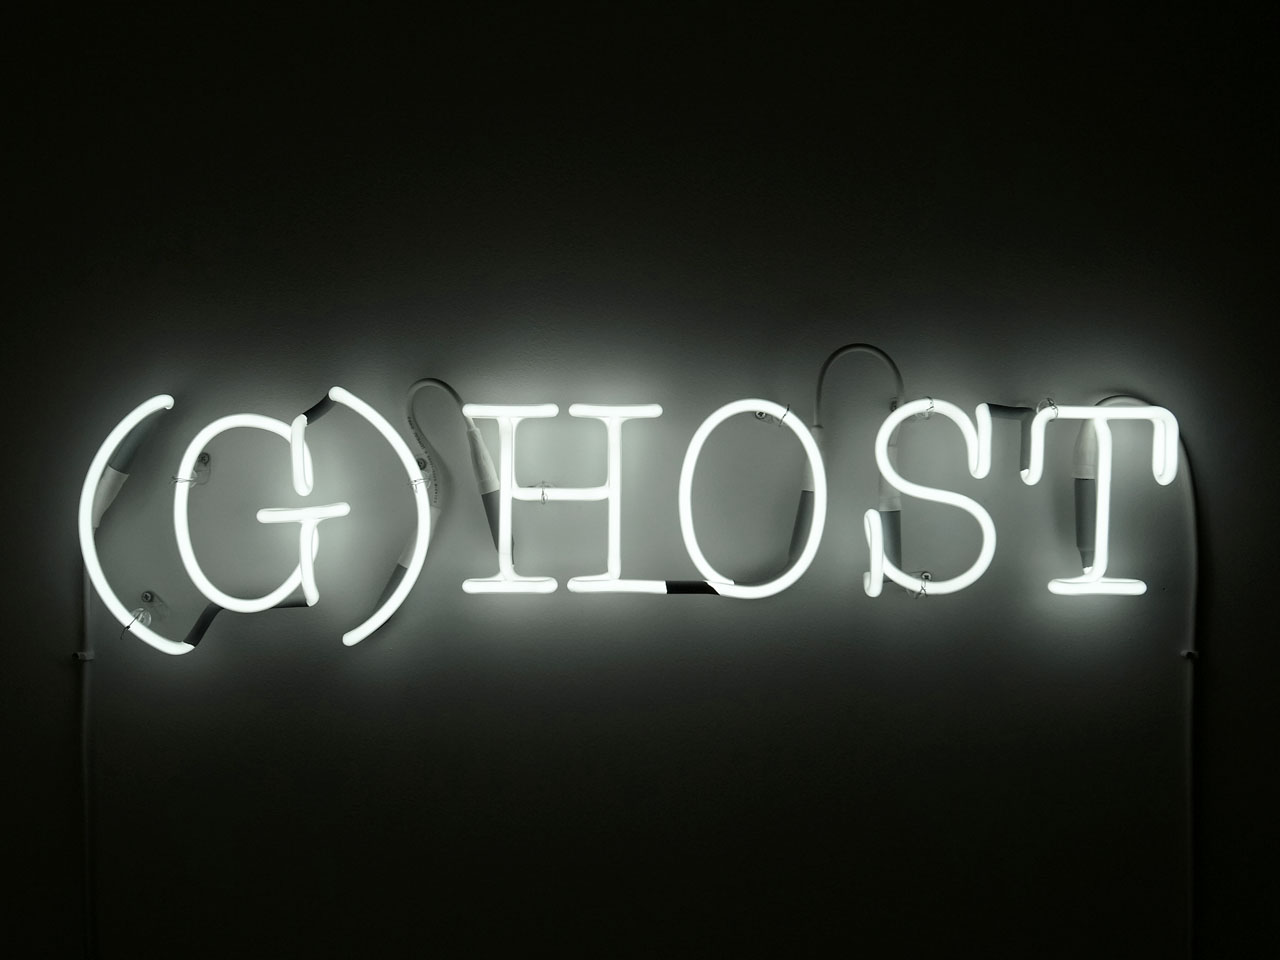 Jlggbblog3 trop de n ons for Neon artiste contemporain